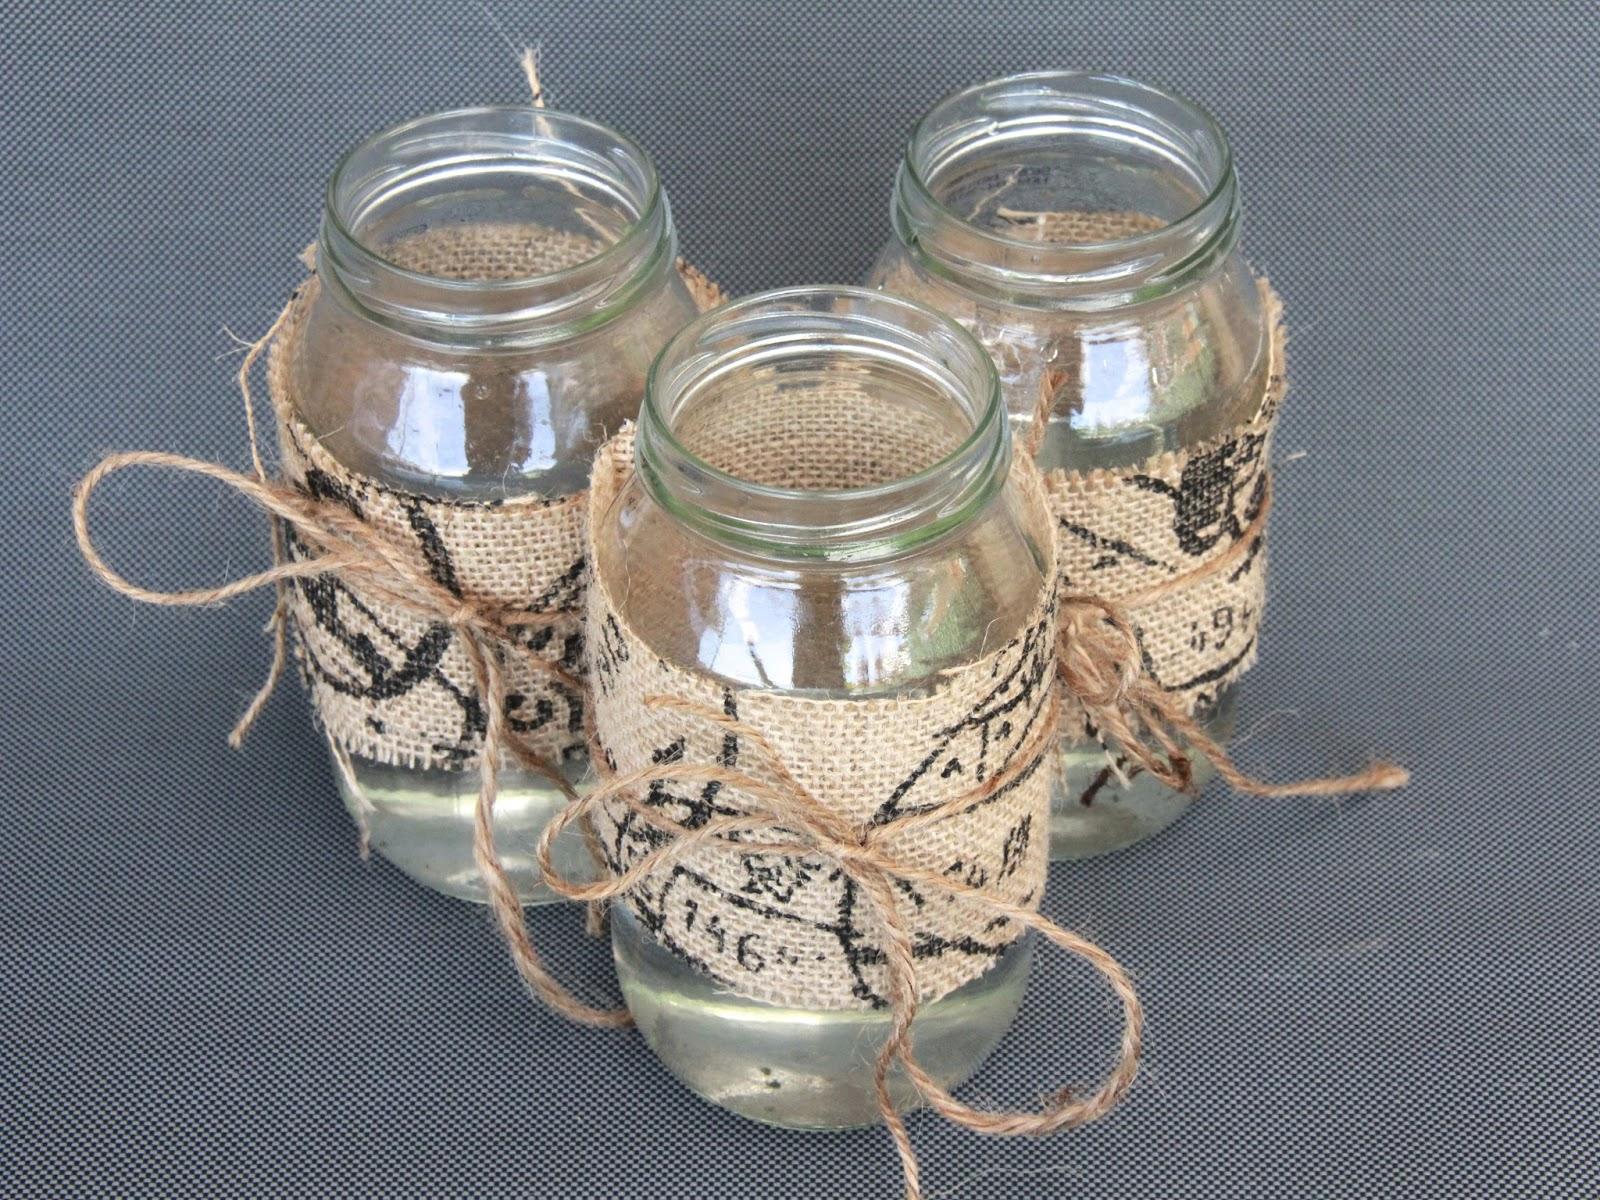 DIY Centrepiece Ideas - Glass Jars Decorated with Burlap ...